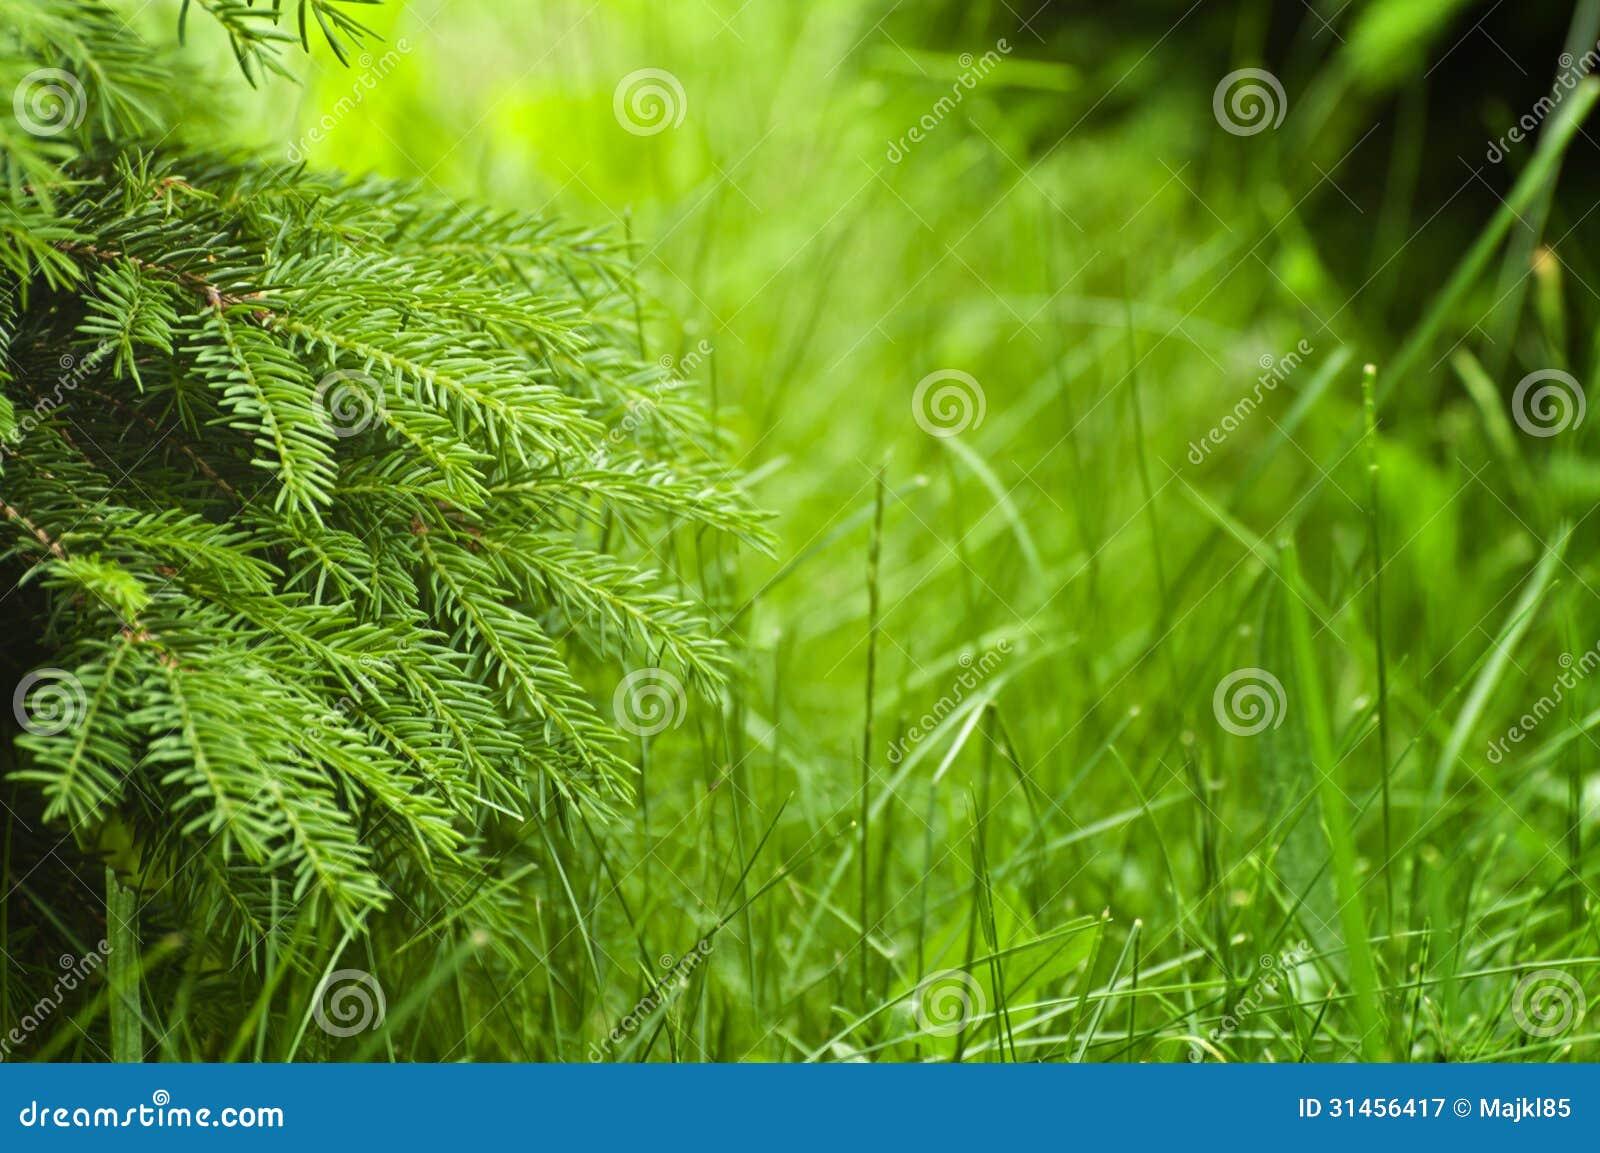 nature spring green tree - photo #16